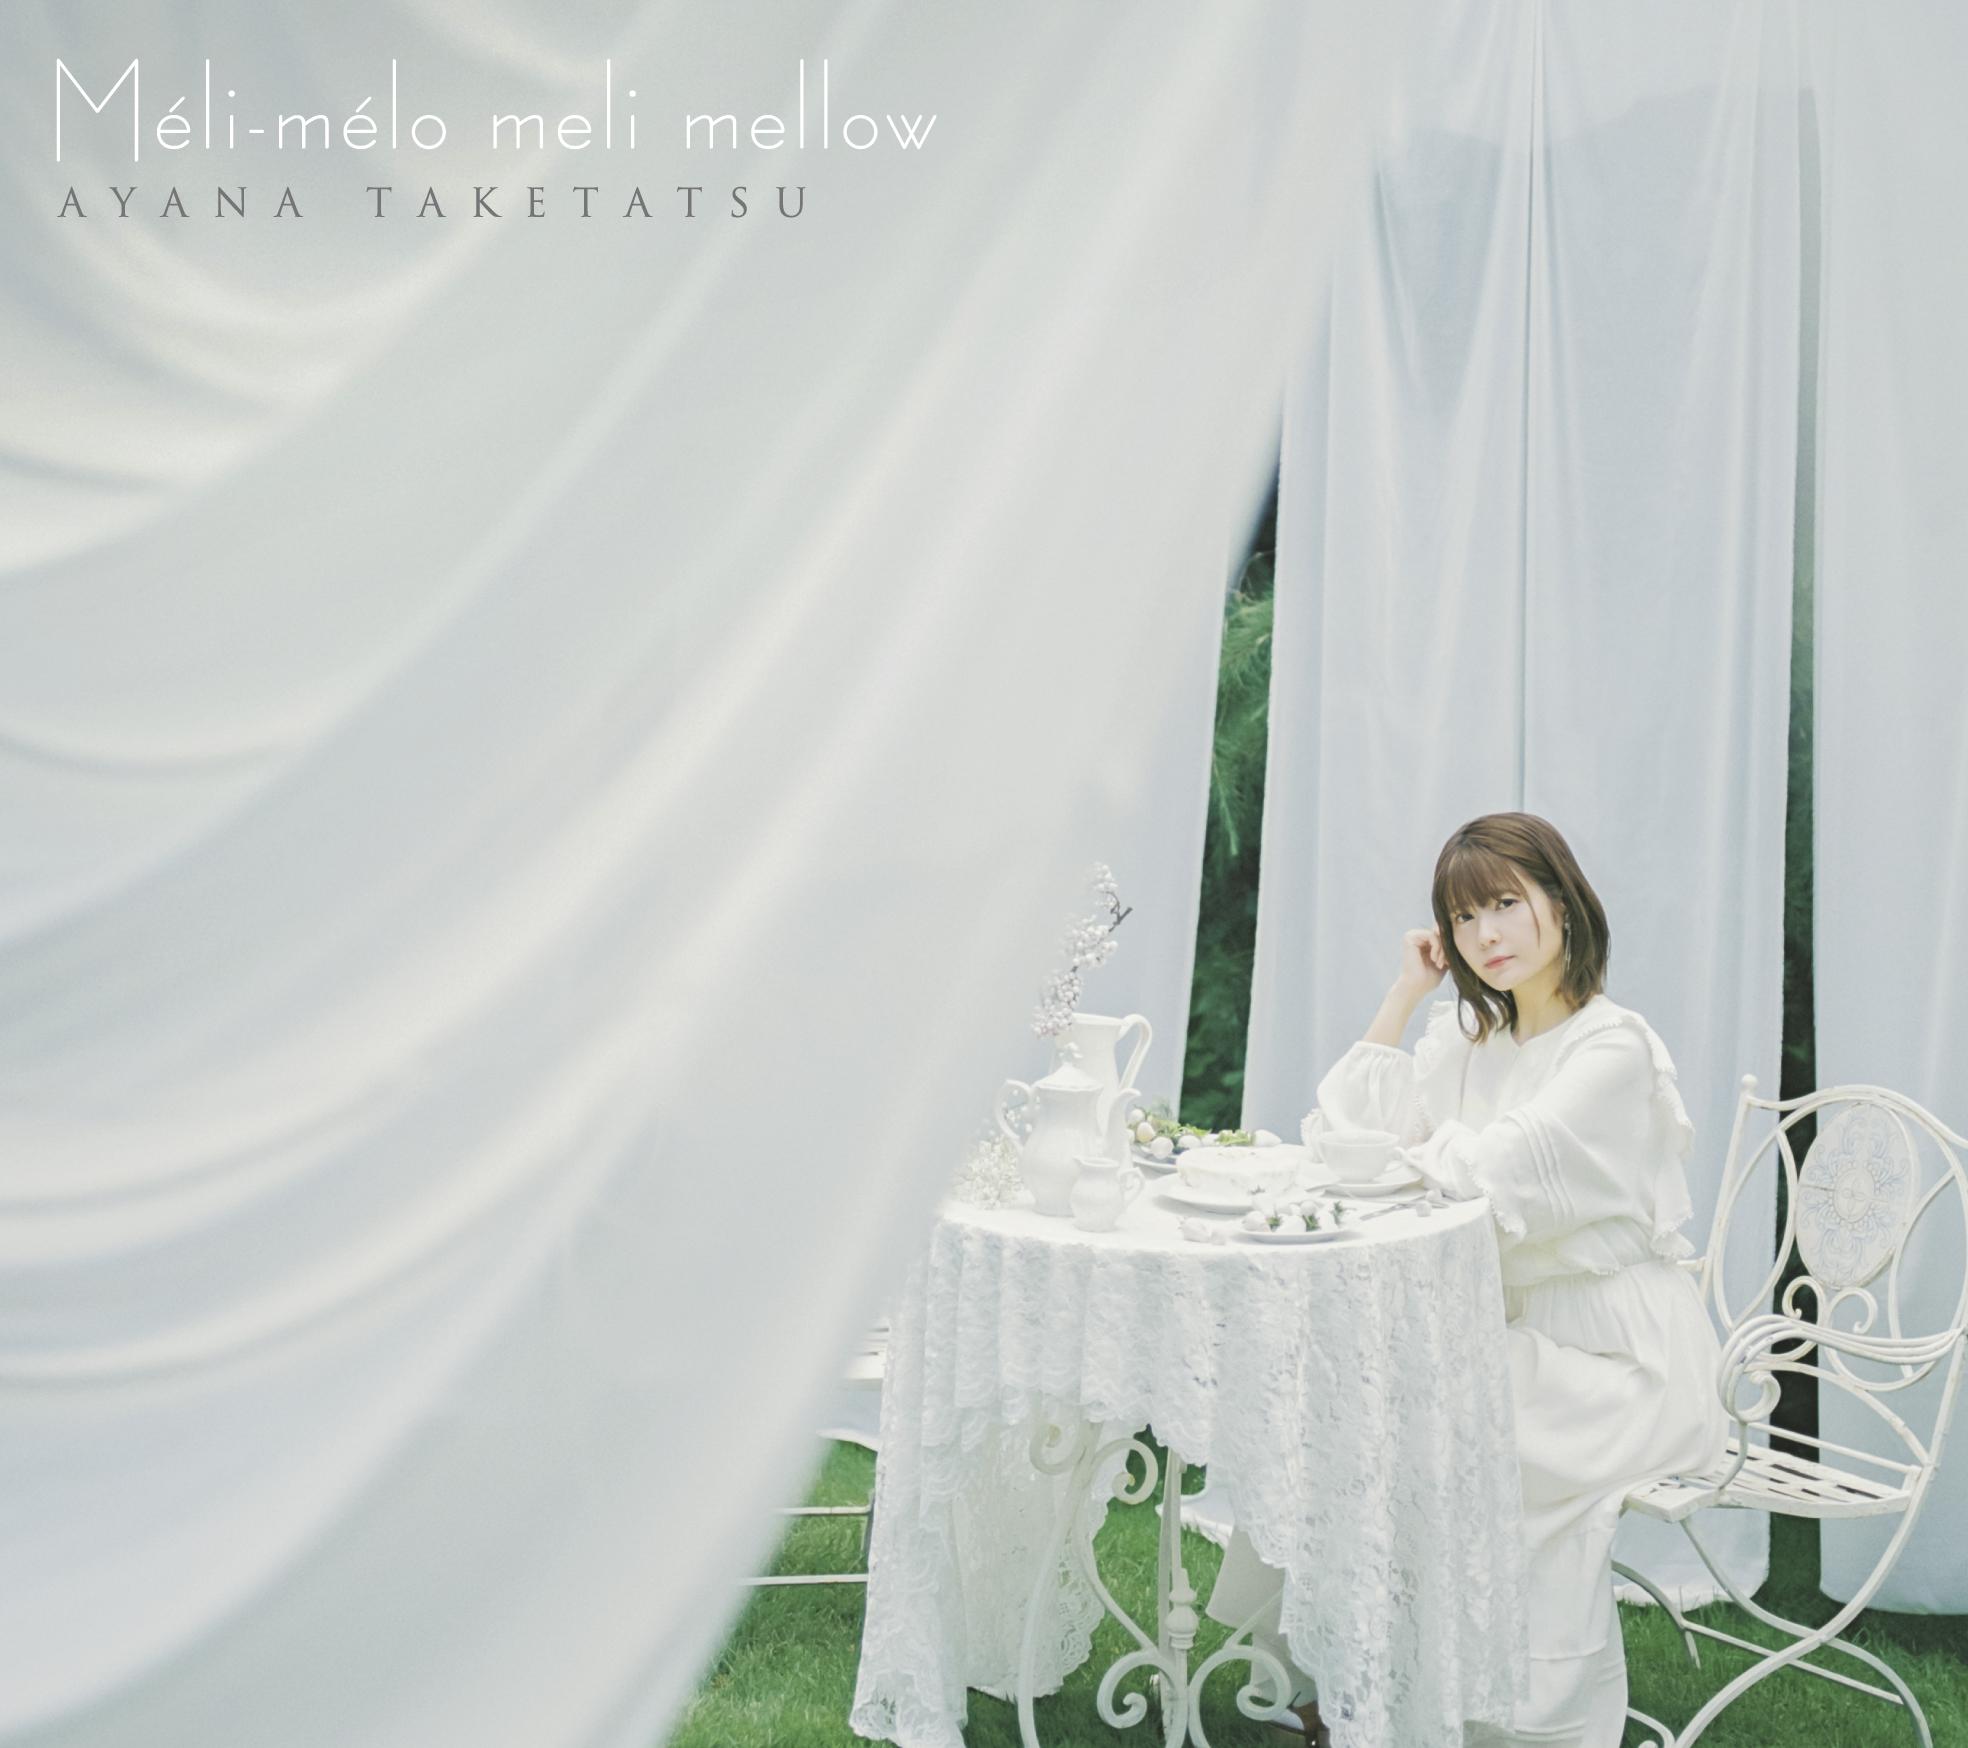 "Taketatsu Ayana Concept Album""Méli-mélo meli mellow"" Limited Edition(CD+Blu-ray) Release in Sep 15th 2021"